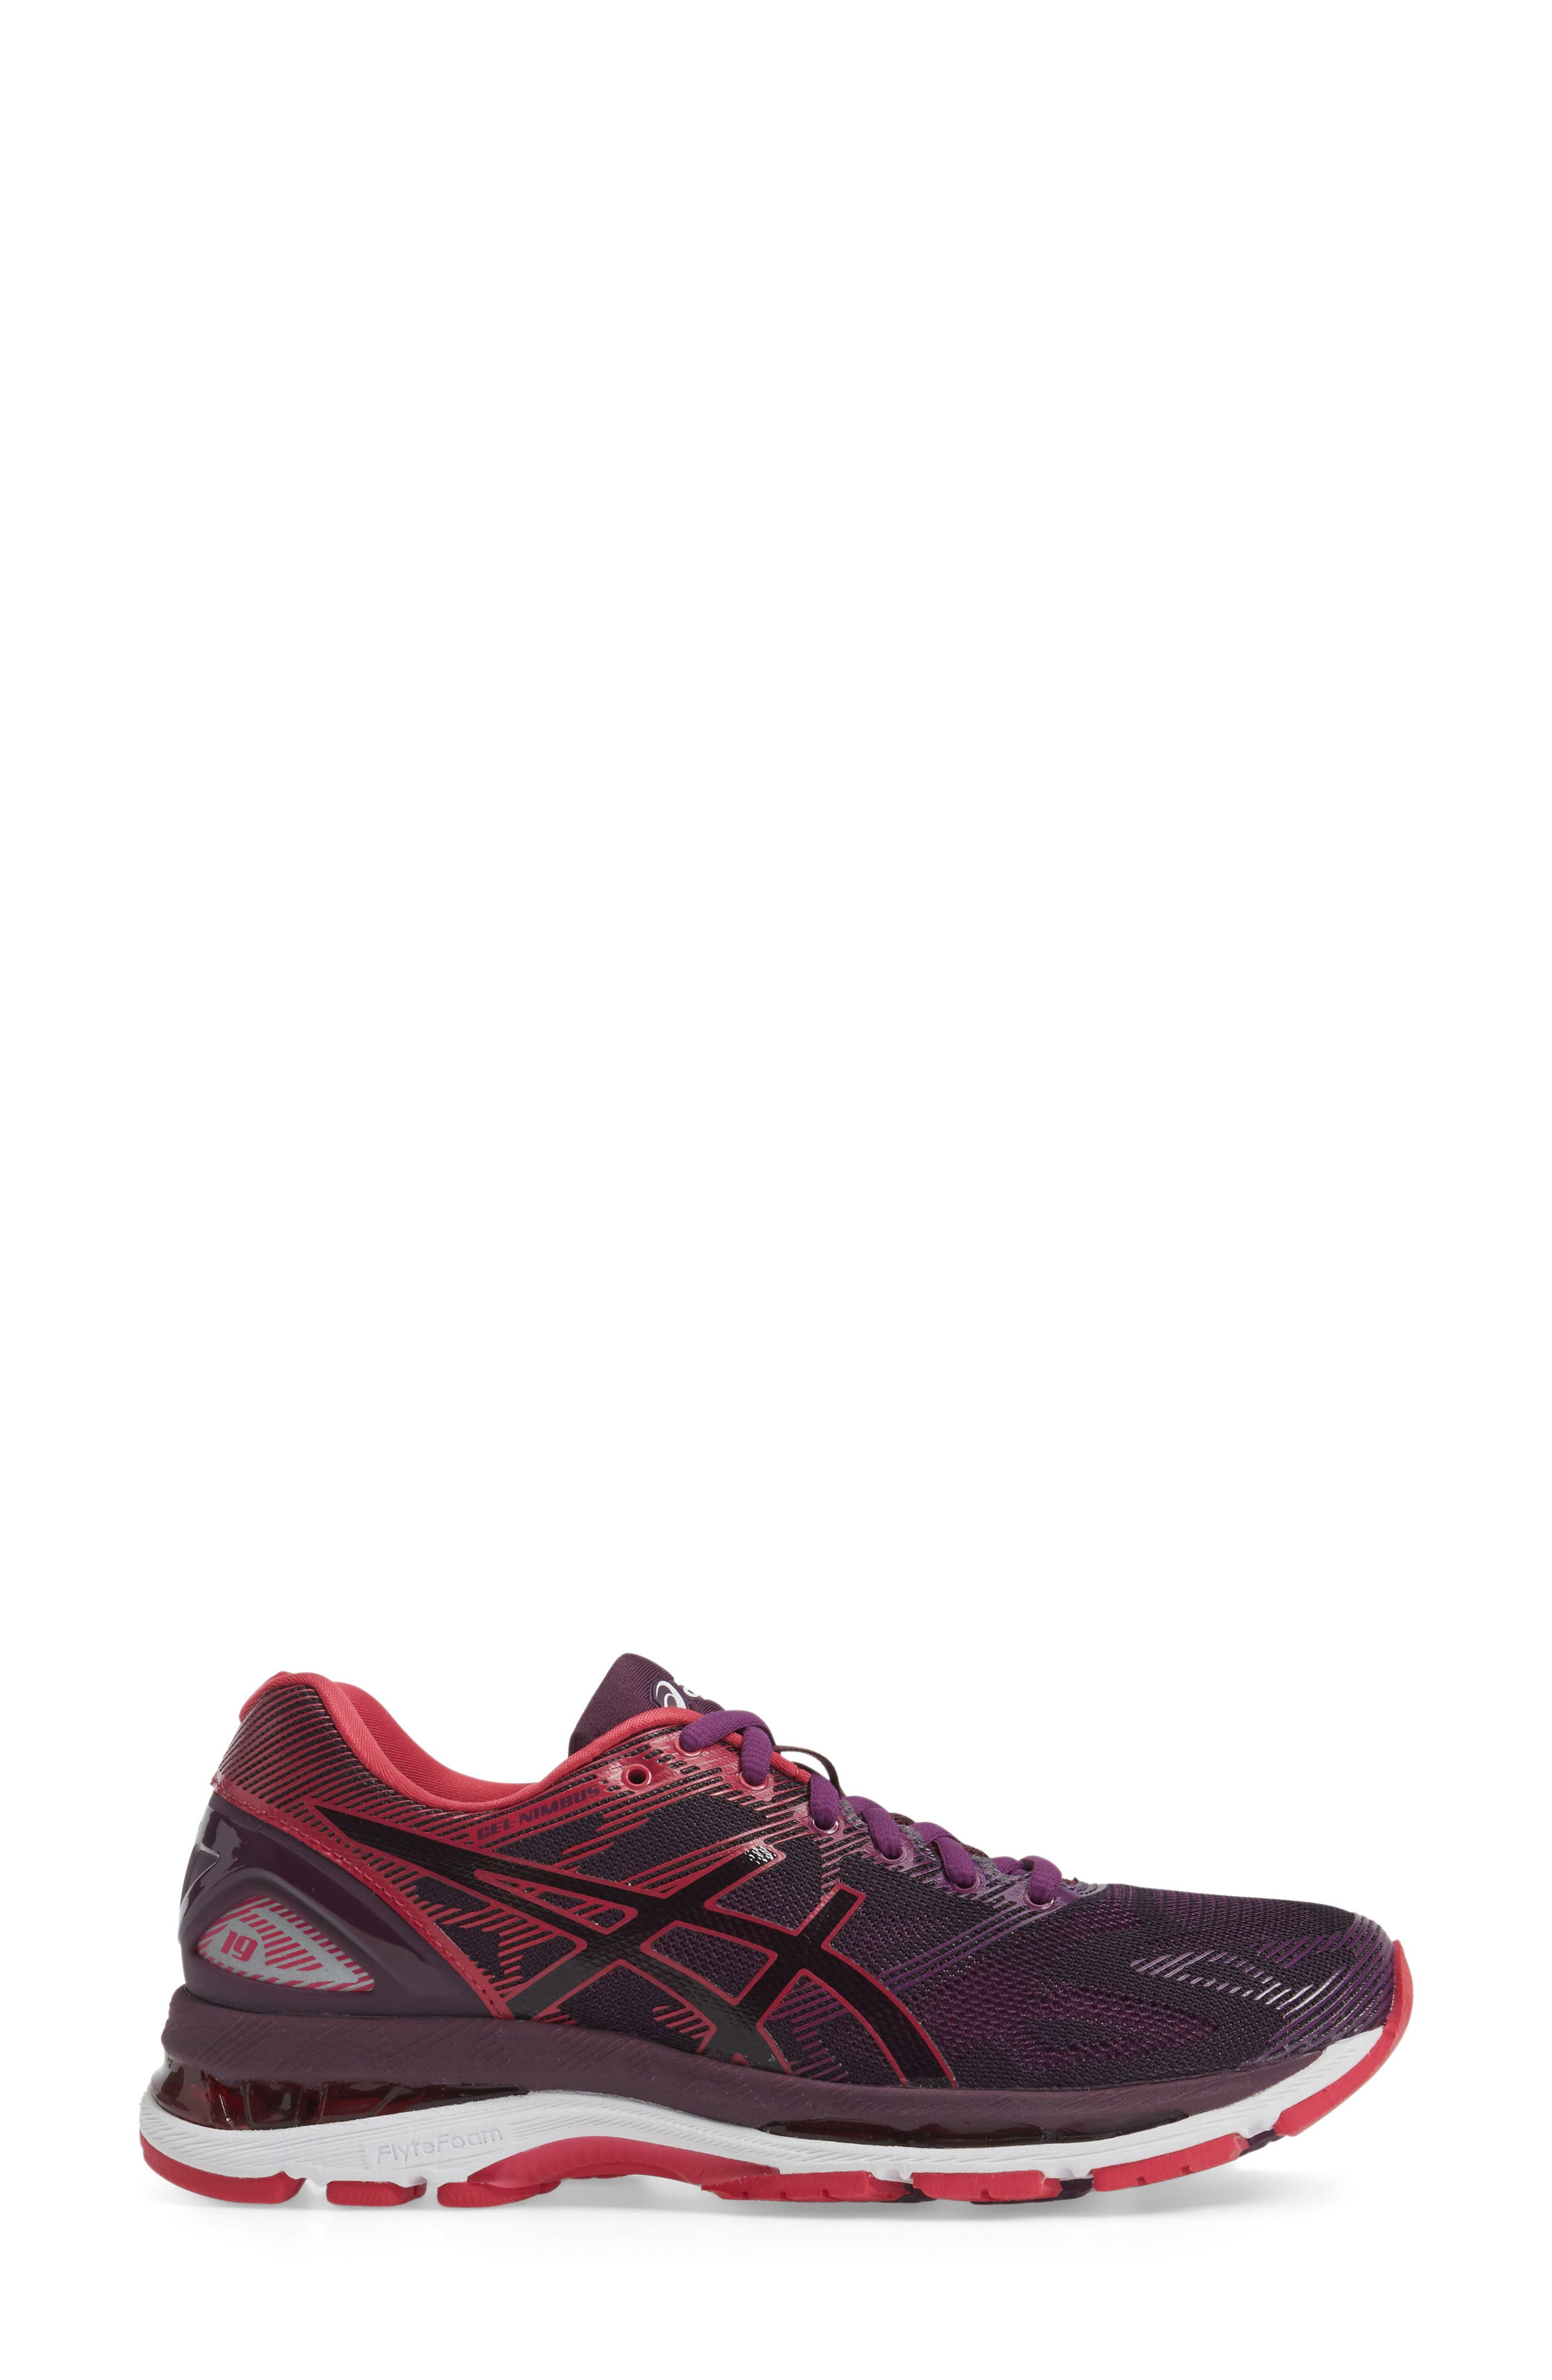 Alternate Image 3  - ASICS® GEL®-Nimbus 19 Running Shoe (Women)